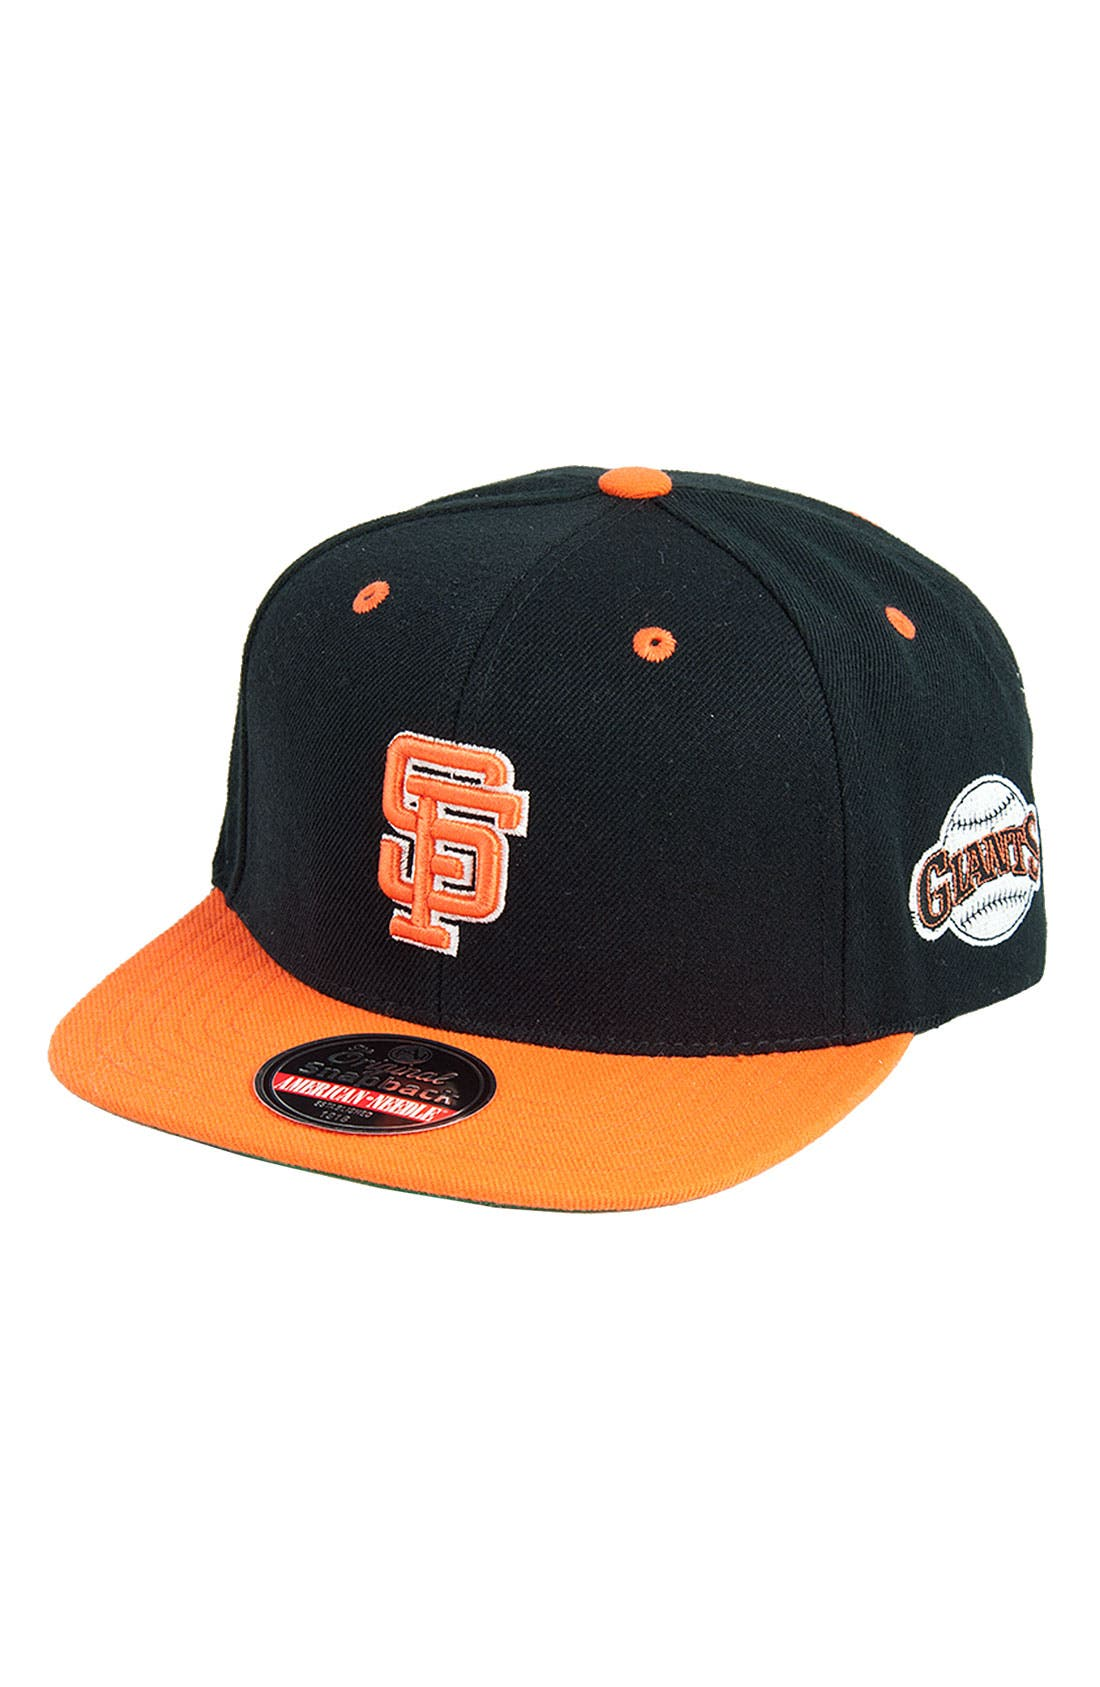 Alternate Image 1 Selected - American Needle 'Blockhead Giants' Snapback Baseball Cap